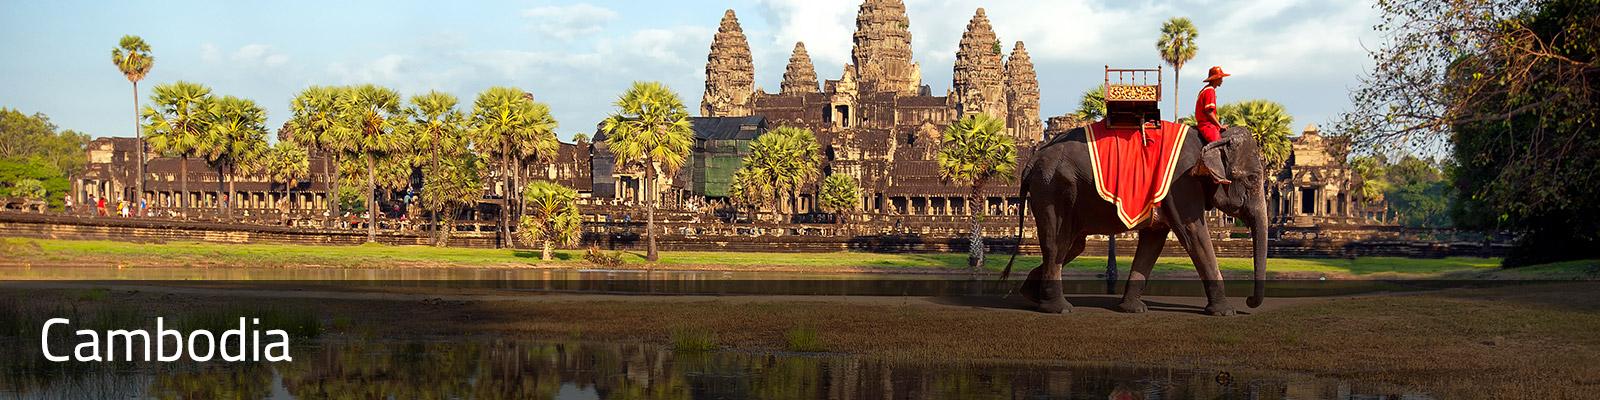 casino recruitment cambodia